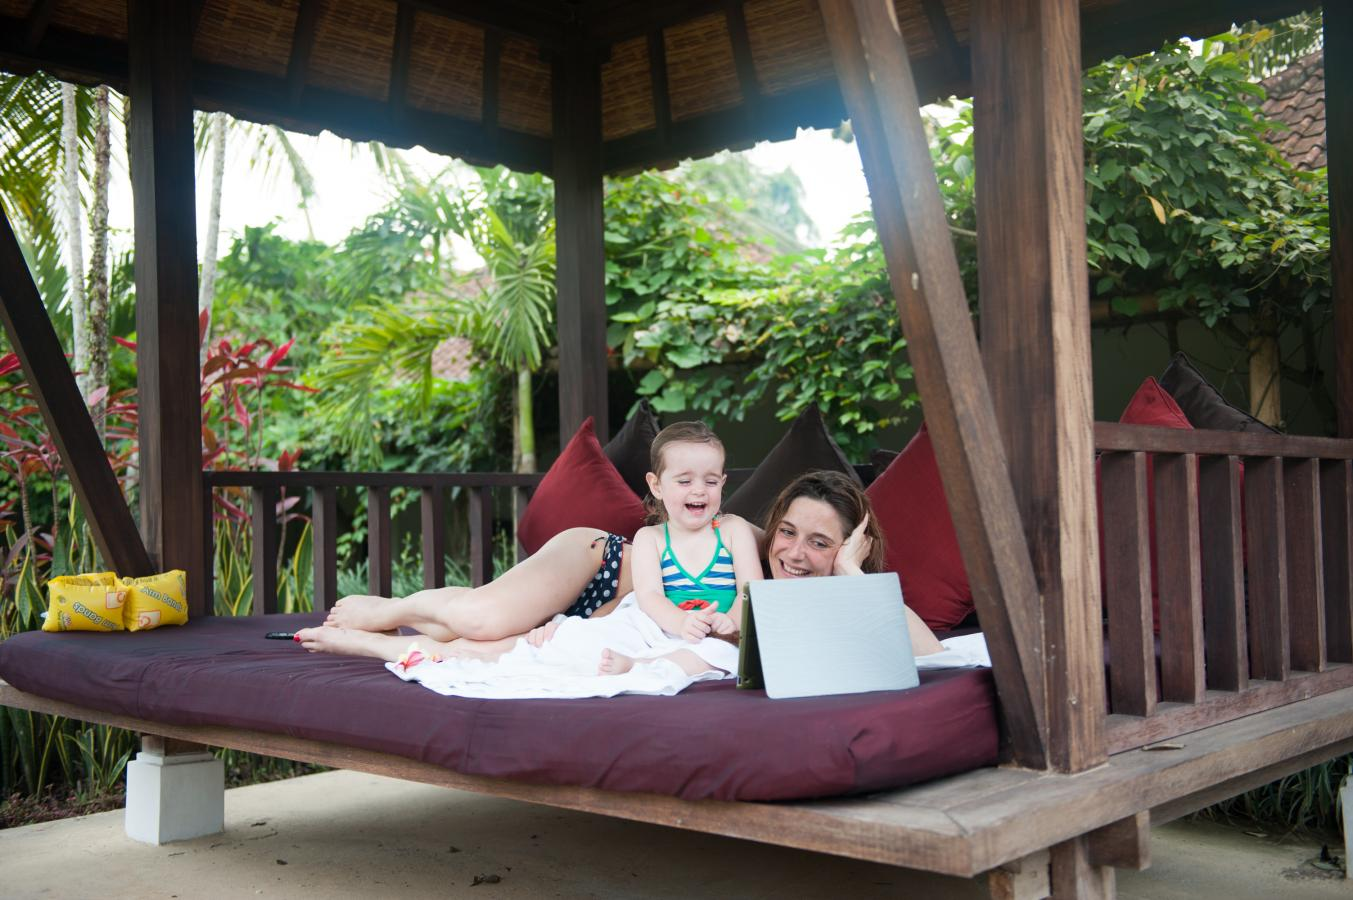 siesta-after-swimming-Bali